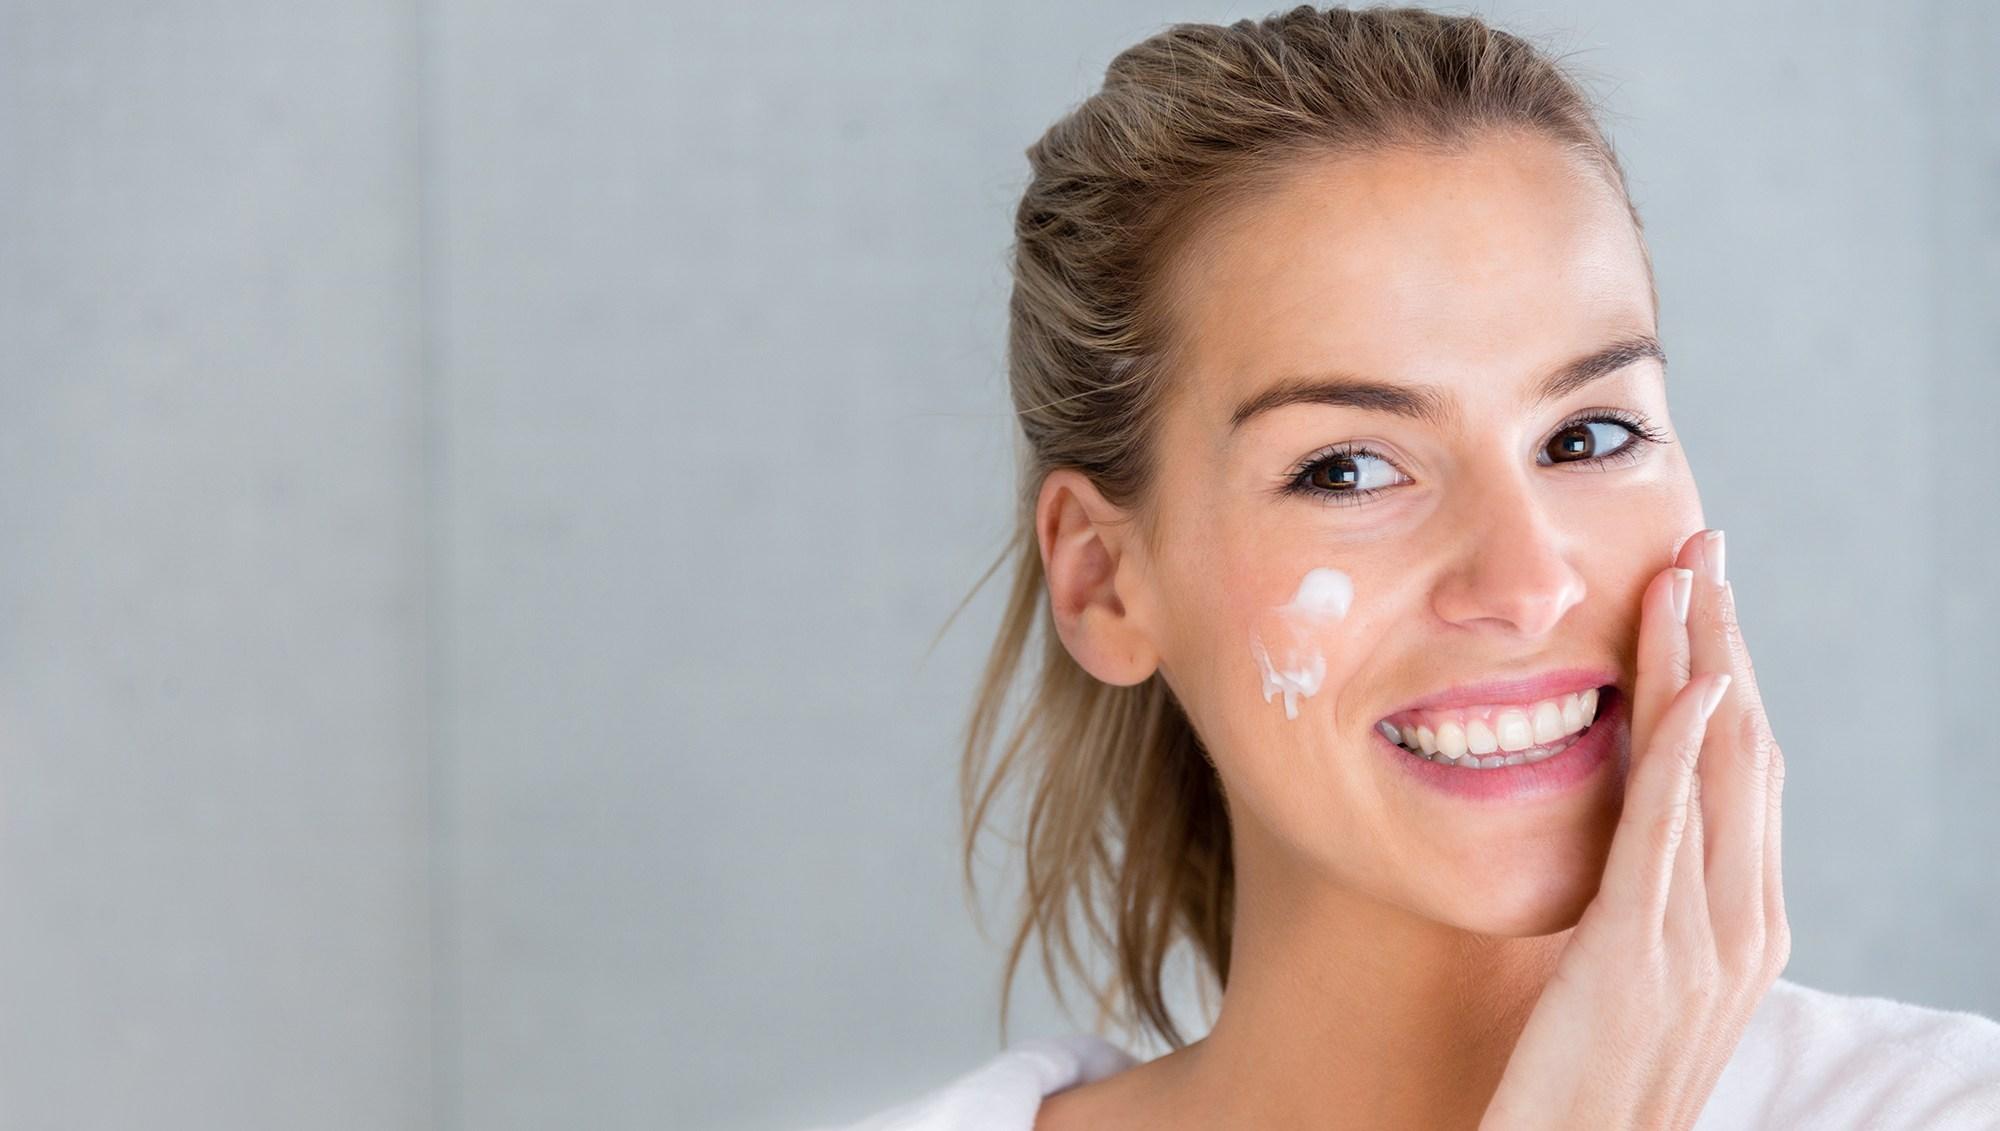 Beauty portrait of a woman using moisturising cream